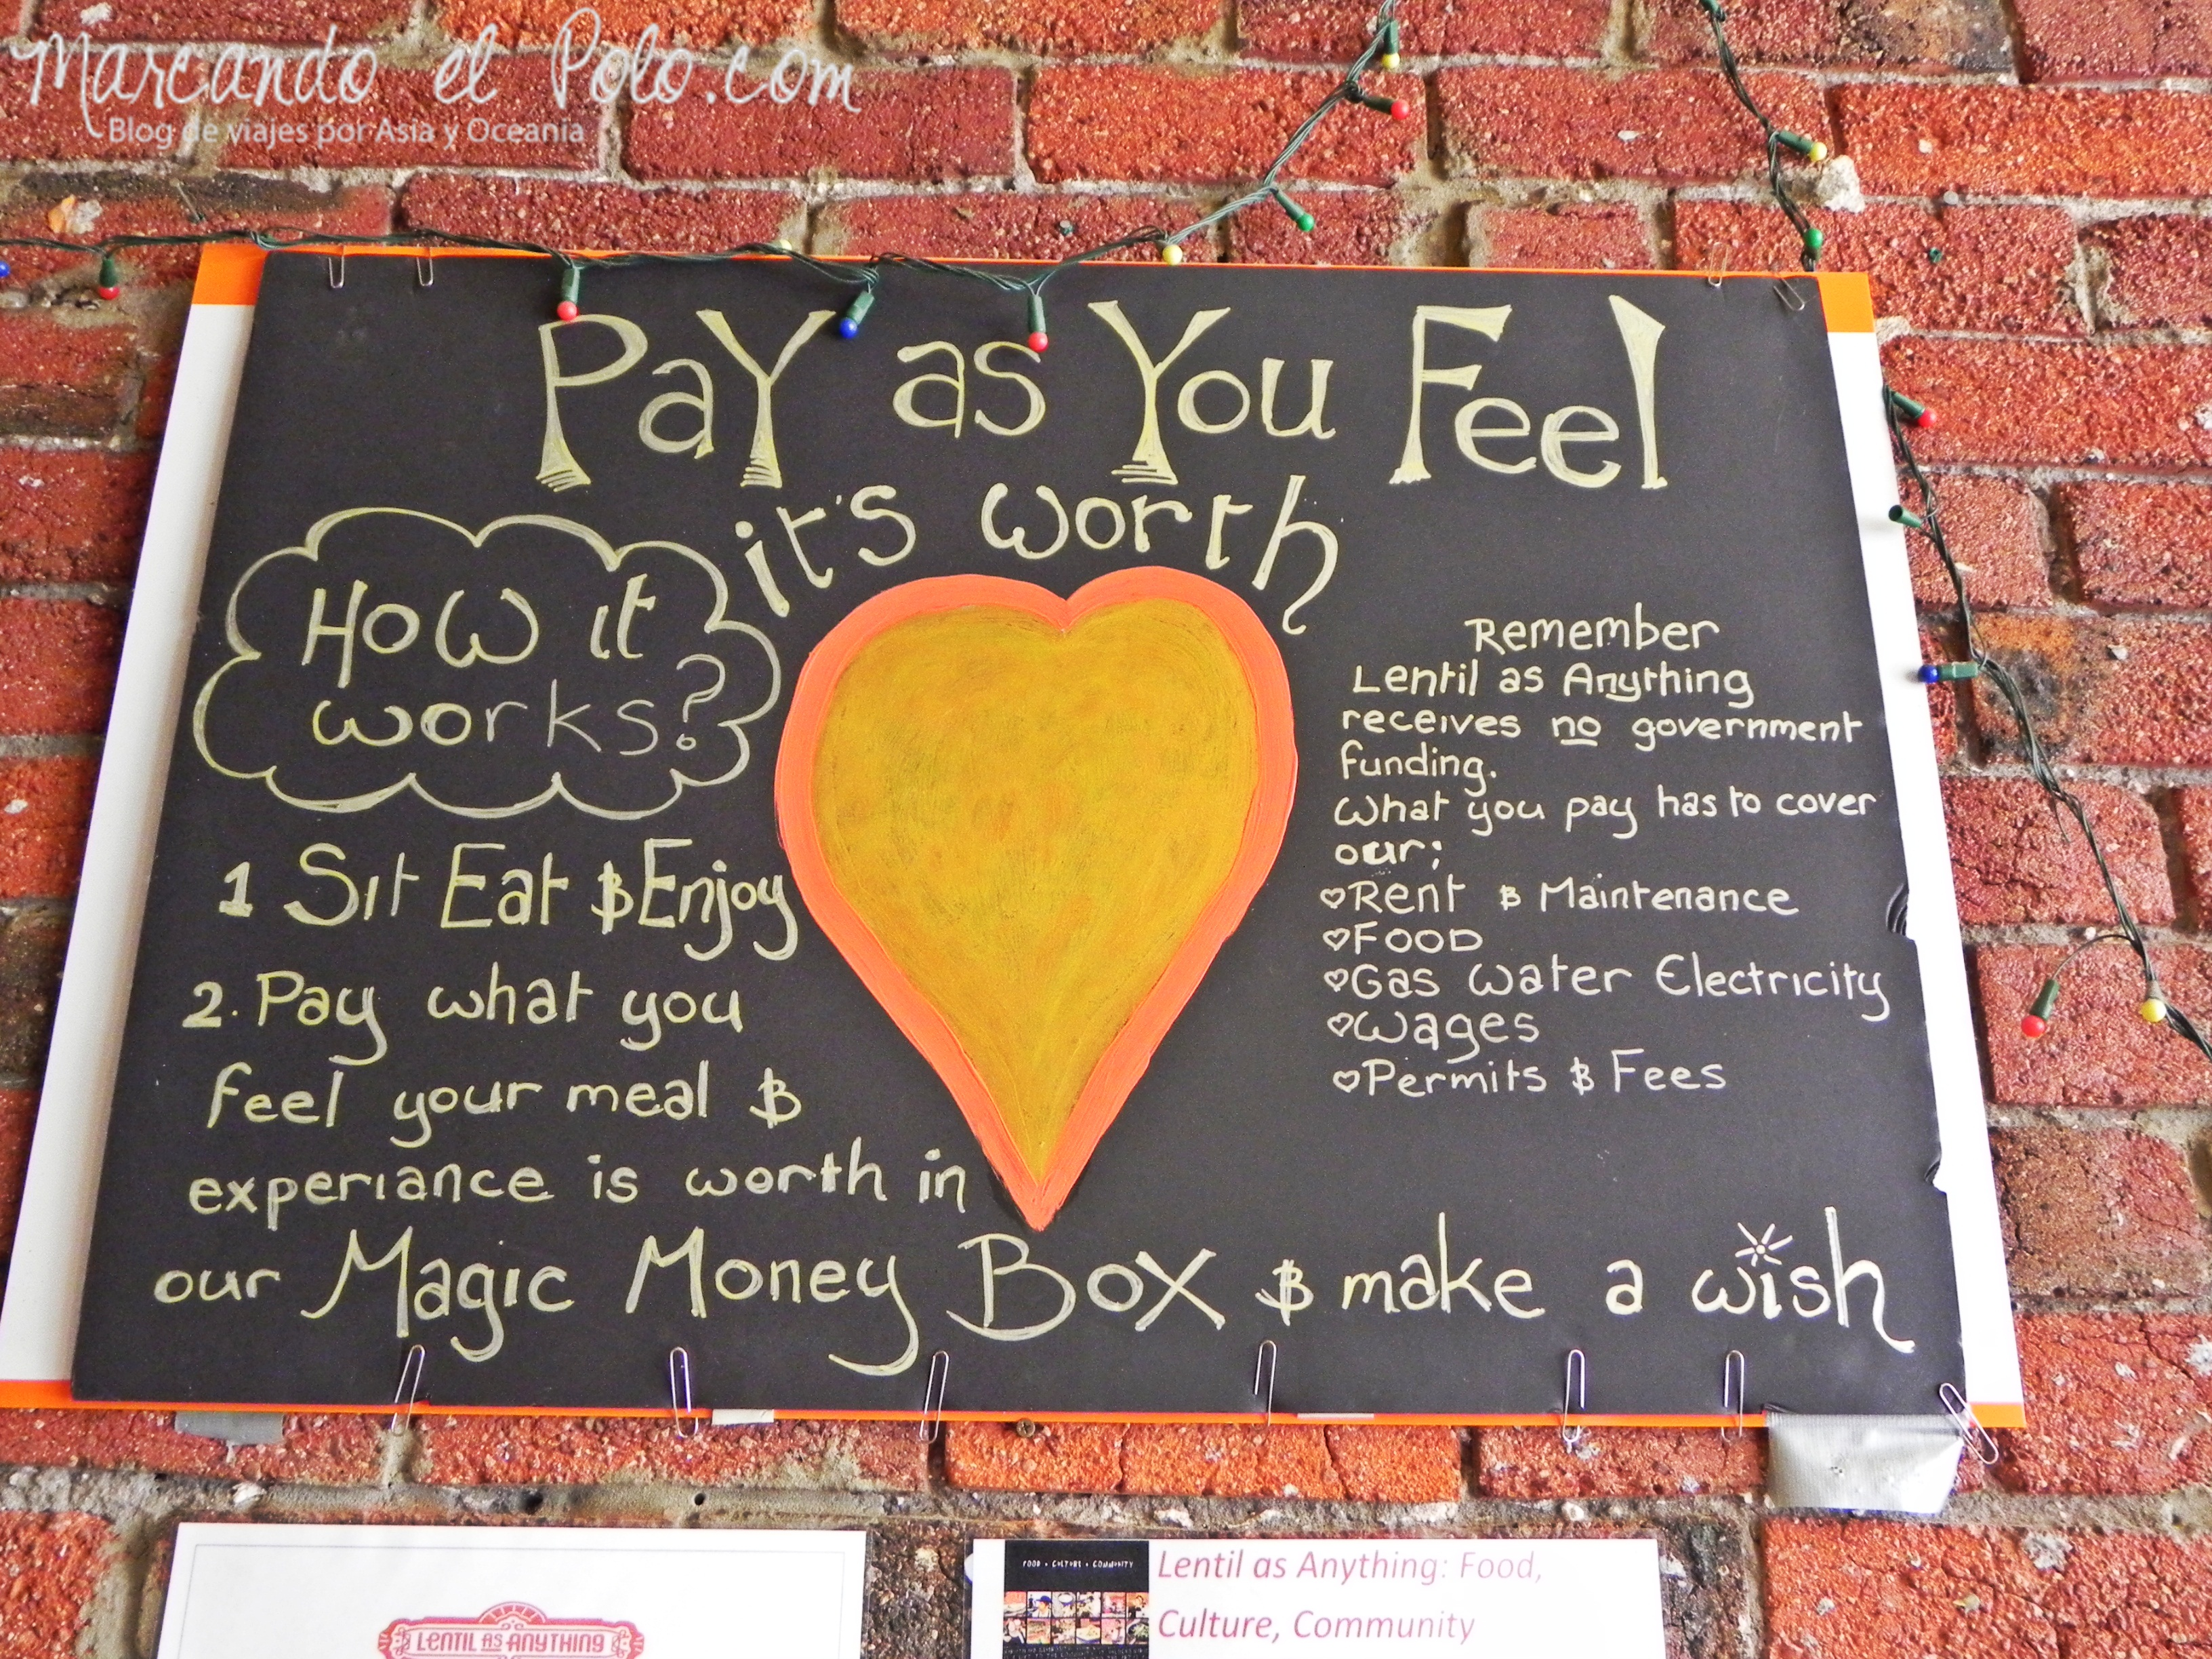 Viajar barato por Melbourne: restaurante Lentils